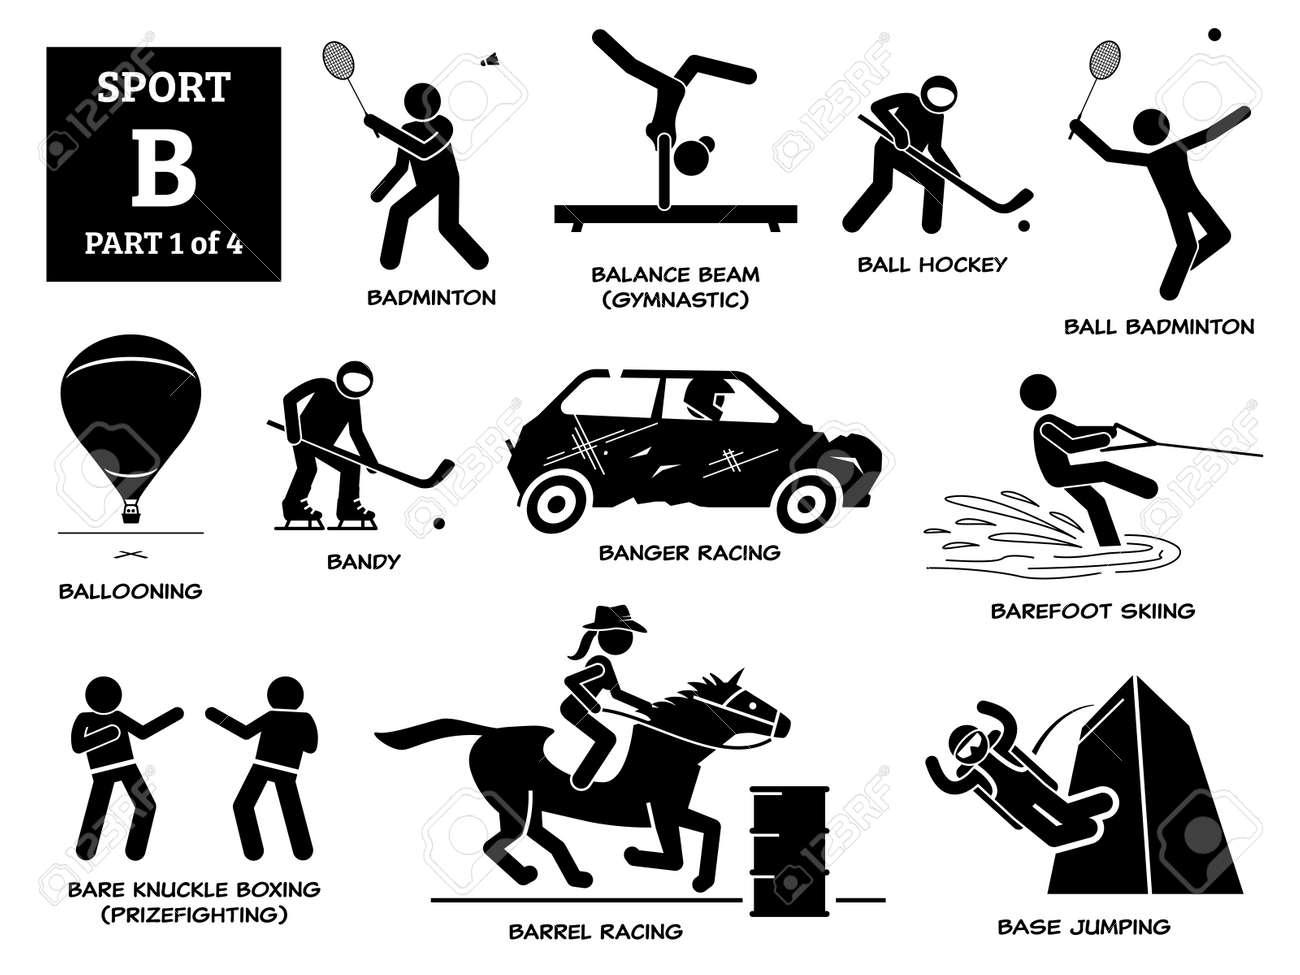 Sports games alphabet B icons pictogram. - 171838571